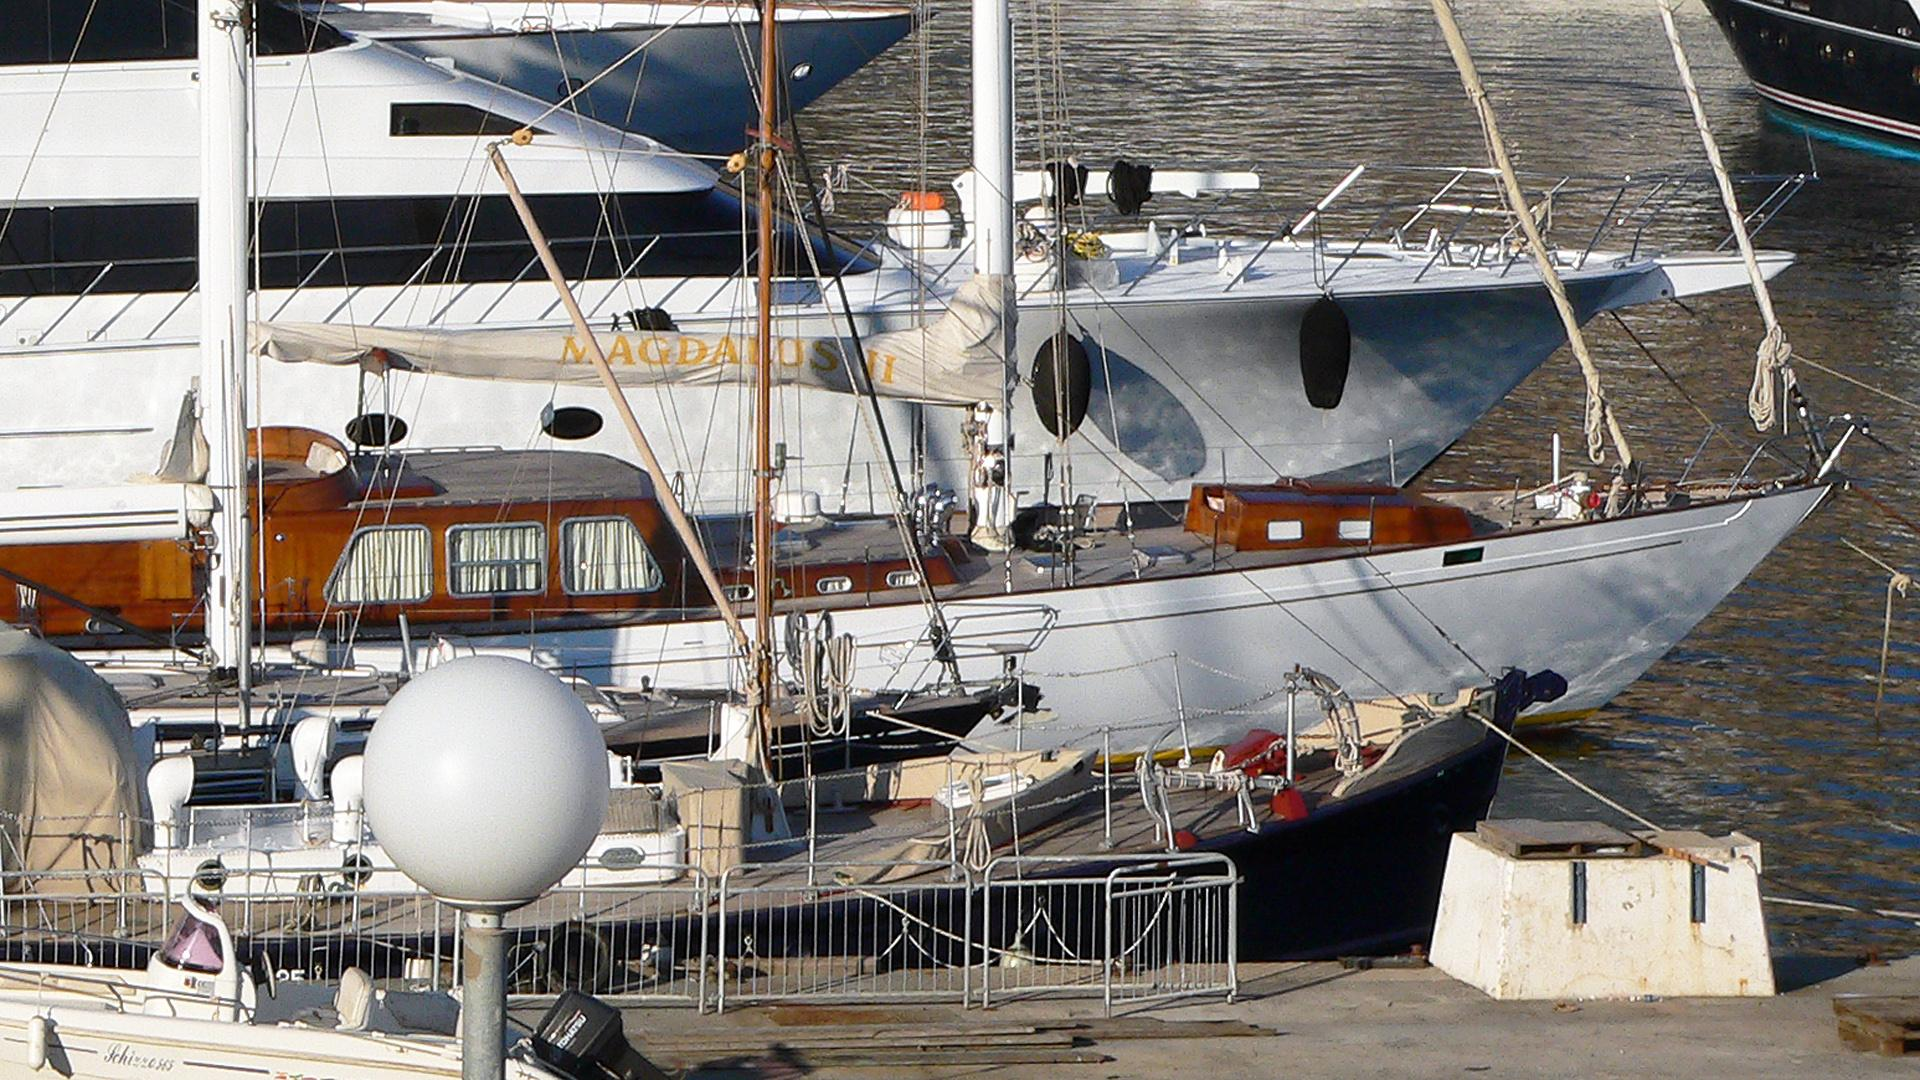 magdalus-secondo-motor-yacht-sangermani-1971-26m-moored-bow-profile